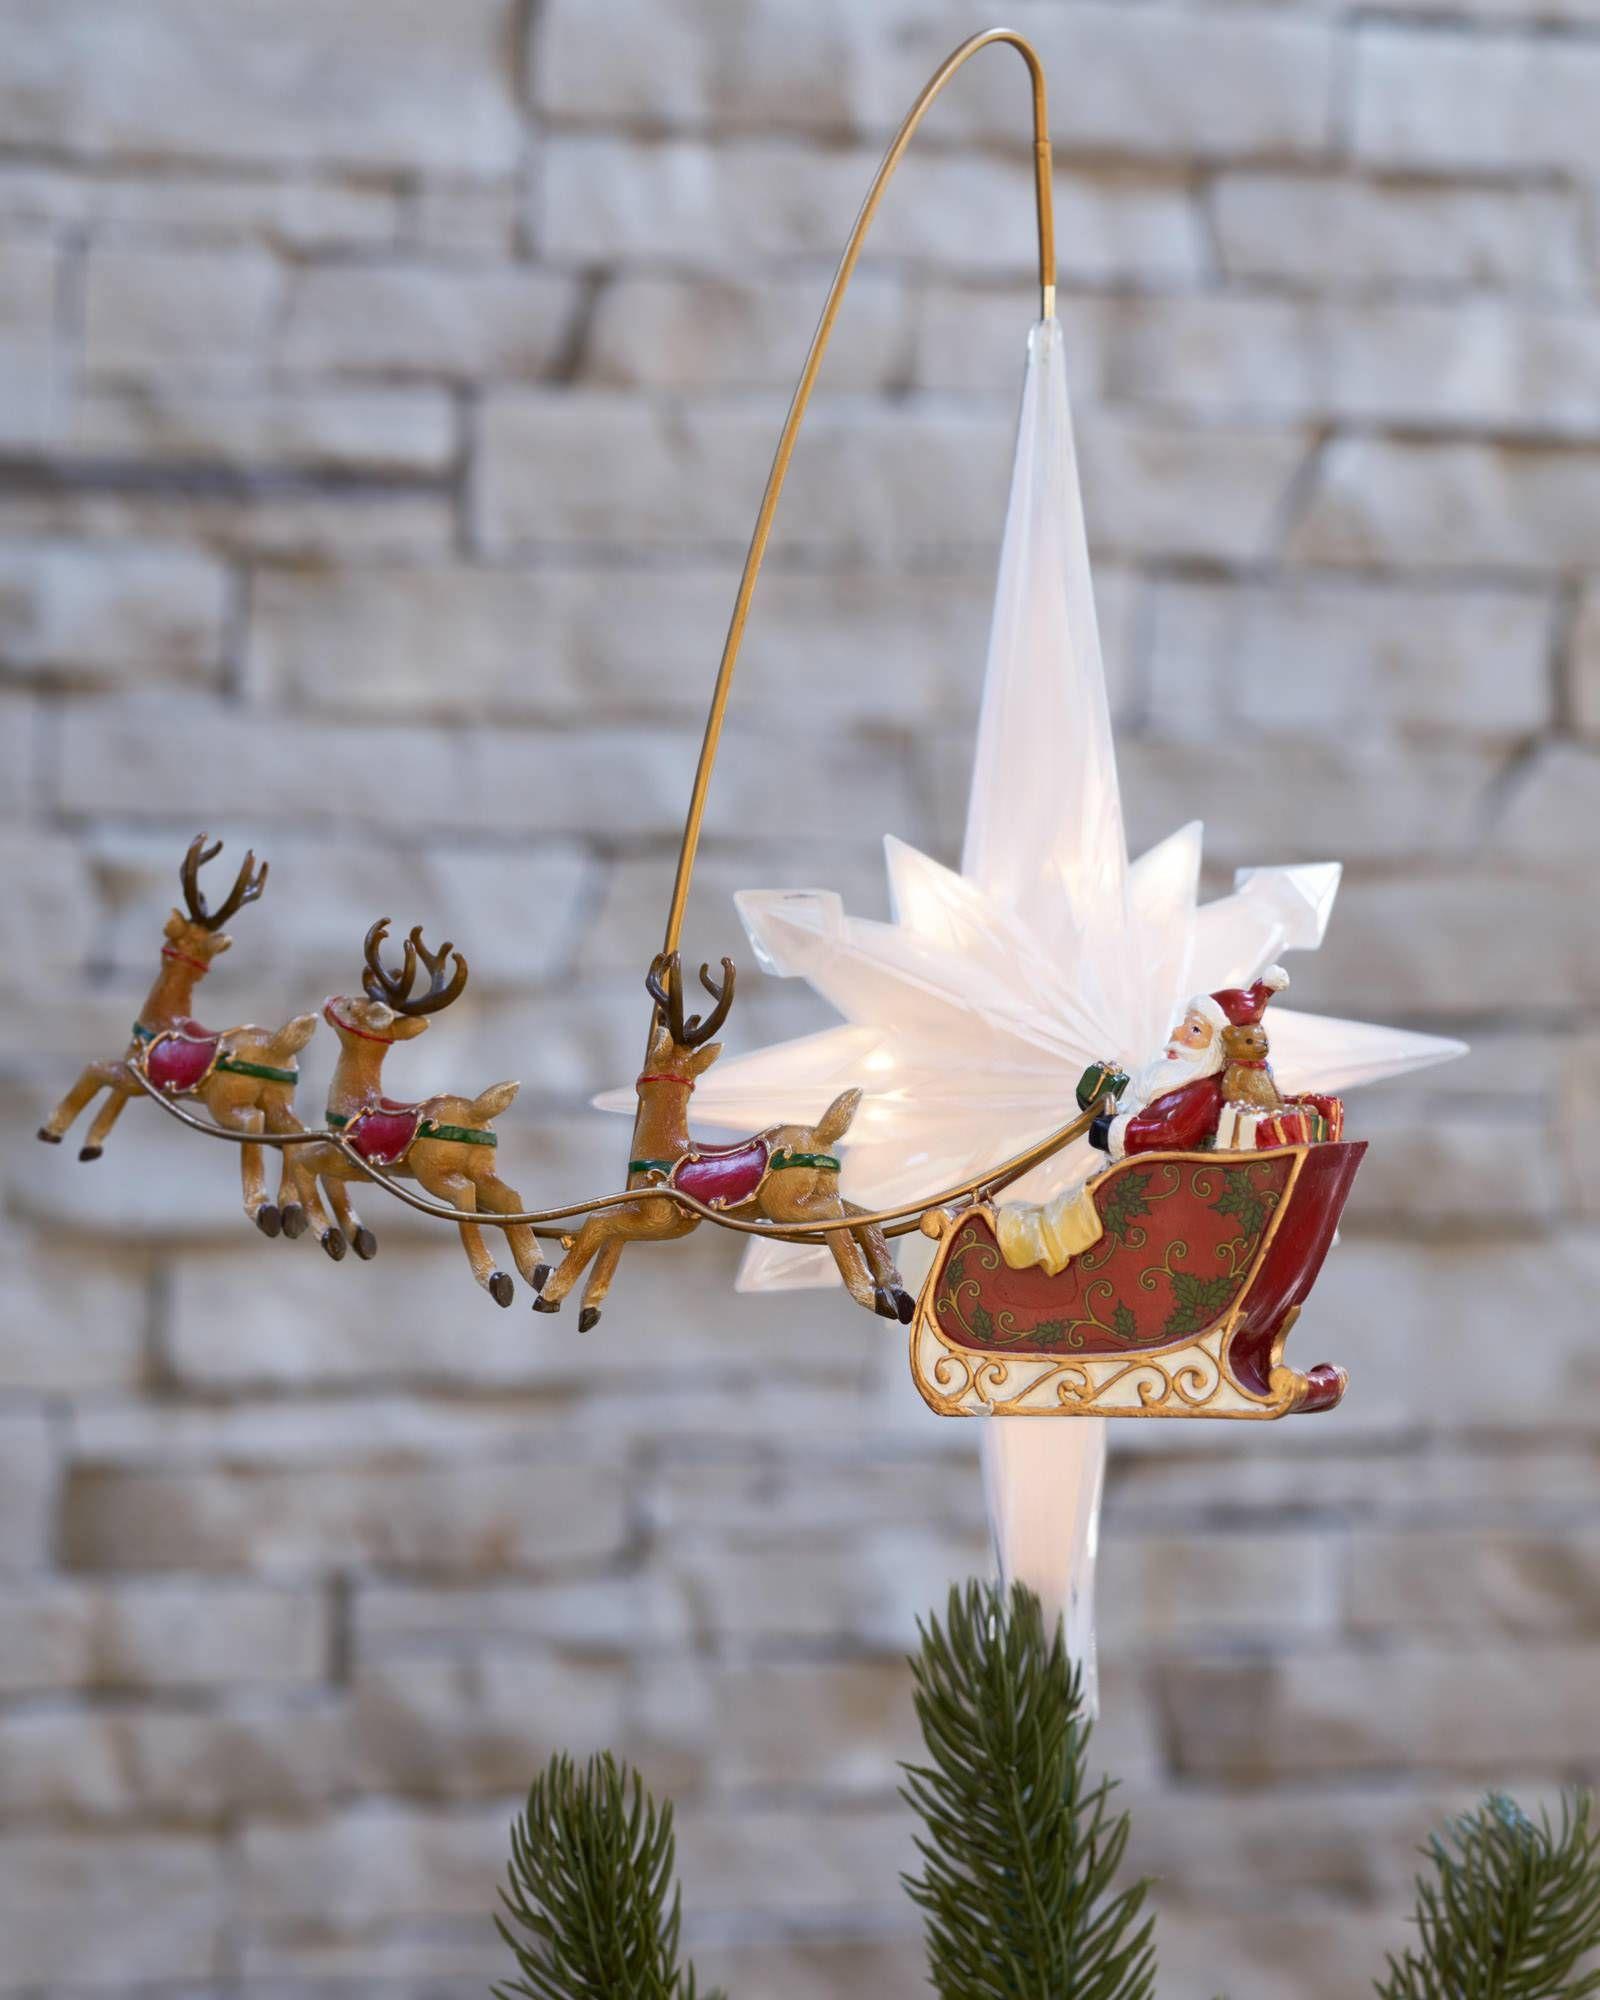 Thomas Kinkade Illuminated Animated Santa Claus Tree Topper Tree Toppers Christmas Tree Toppers Thomas Kinkade Christmas